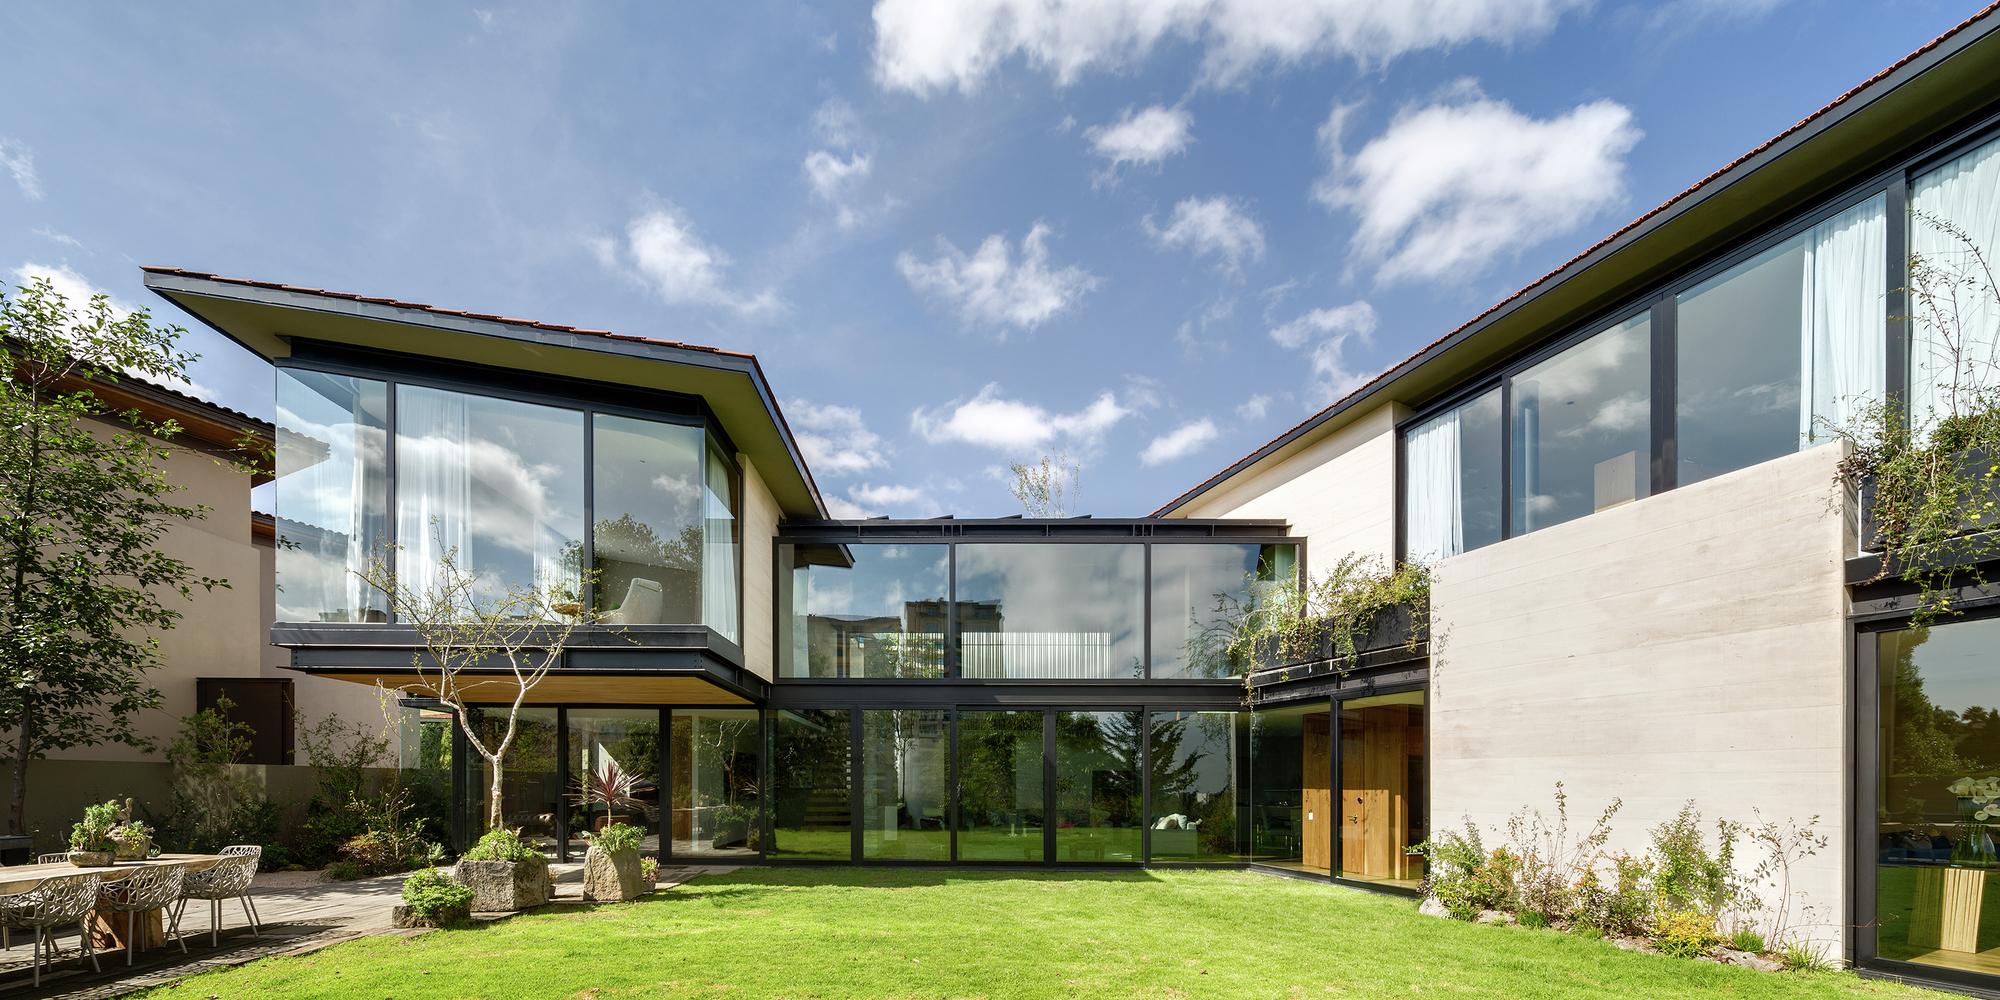 Casa v9 vgz arquitectura y dise o archdaily m xico - Arquitectura de diseno ...